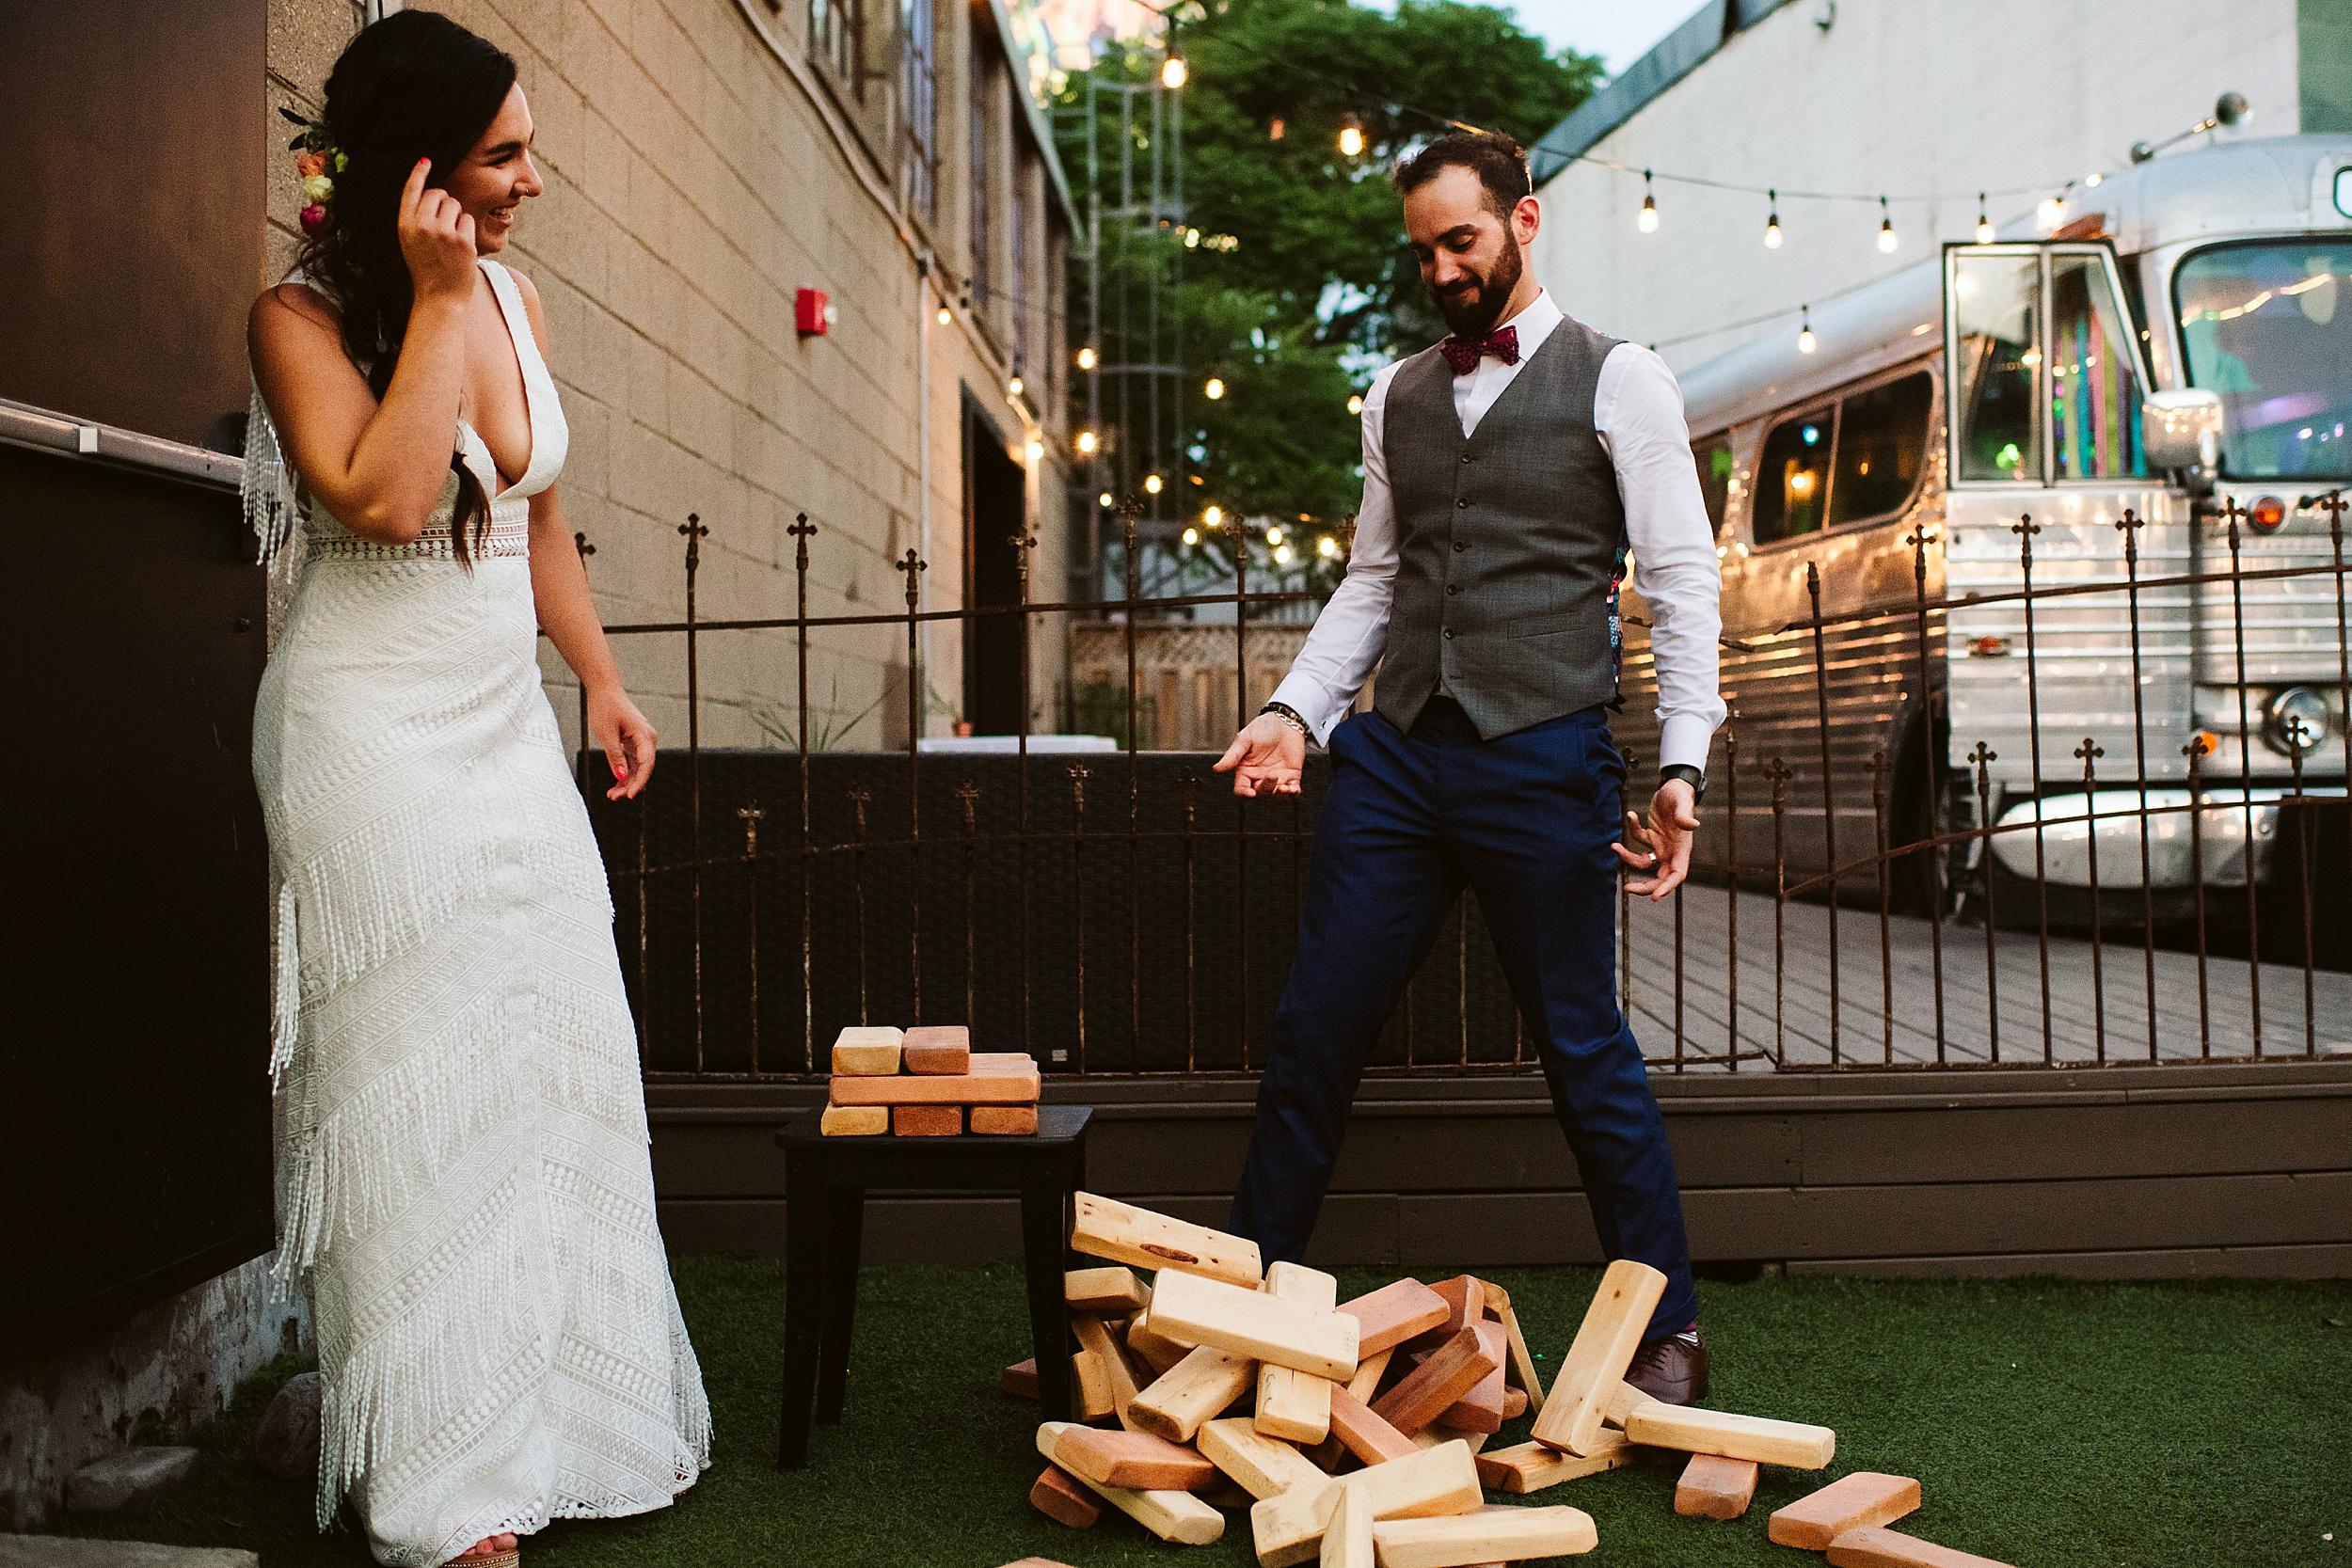 Airship-37-Berkeley-Events-Distillery-District-Wedding-Toronto-Wedding-Photographers_0055.jpg